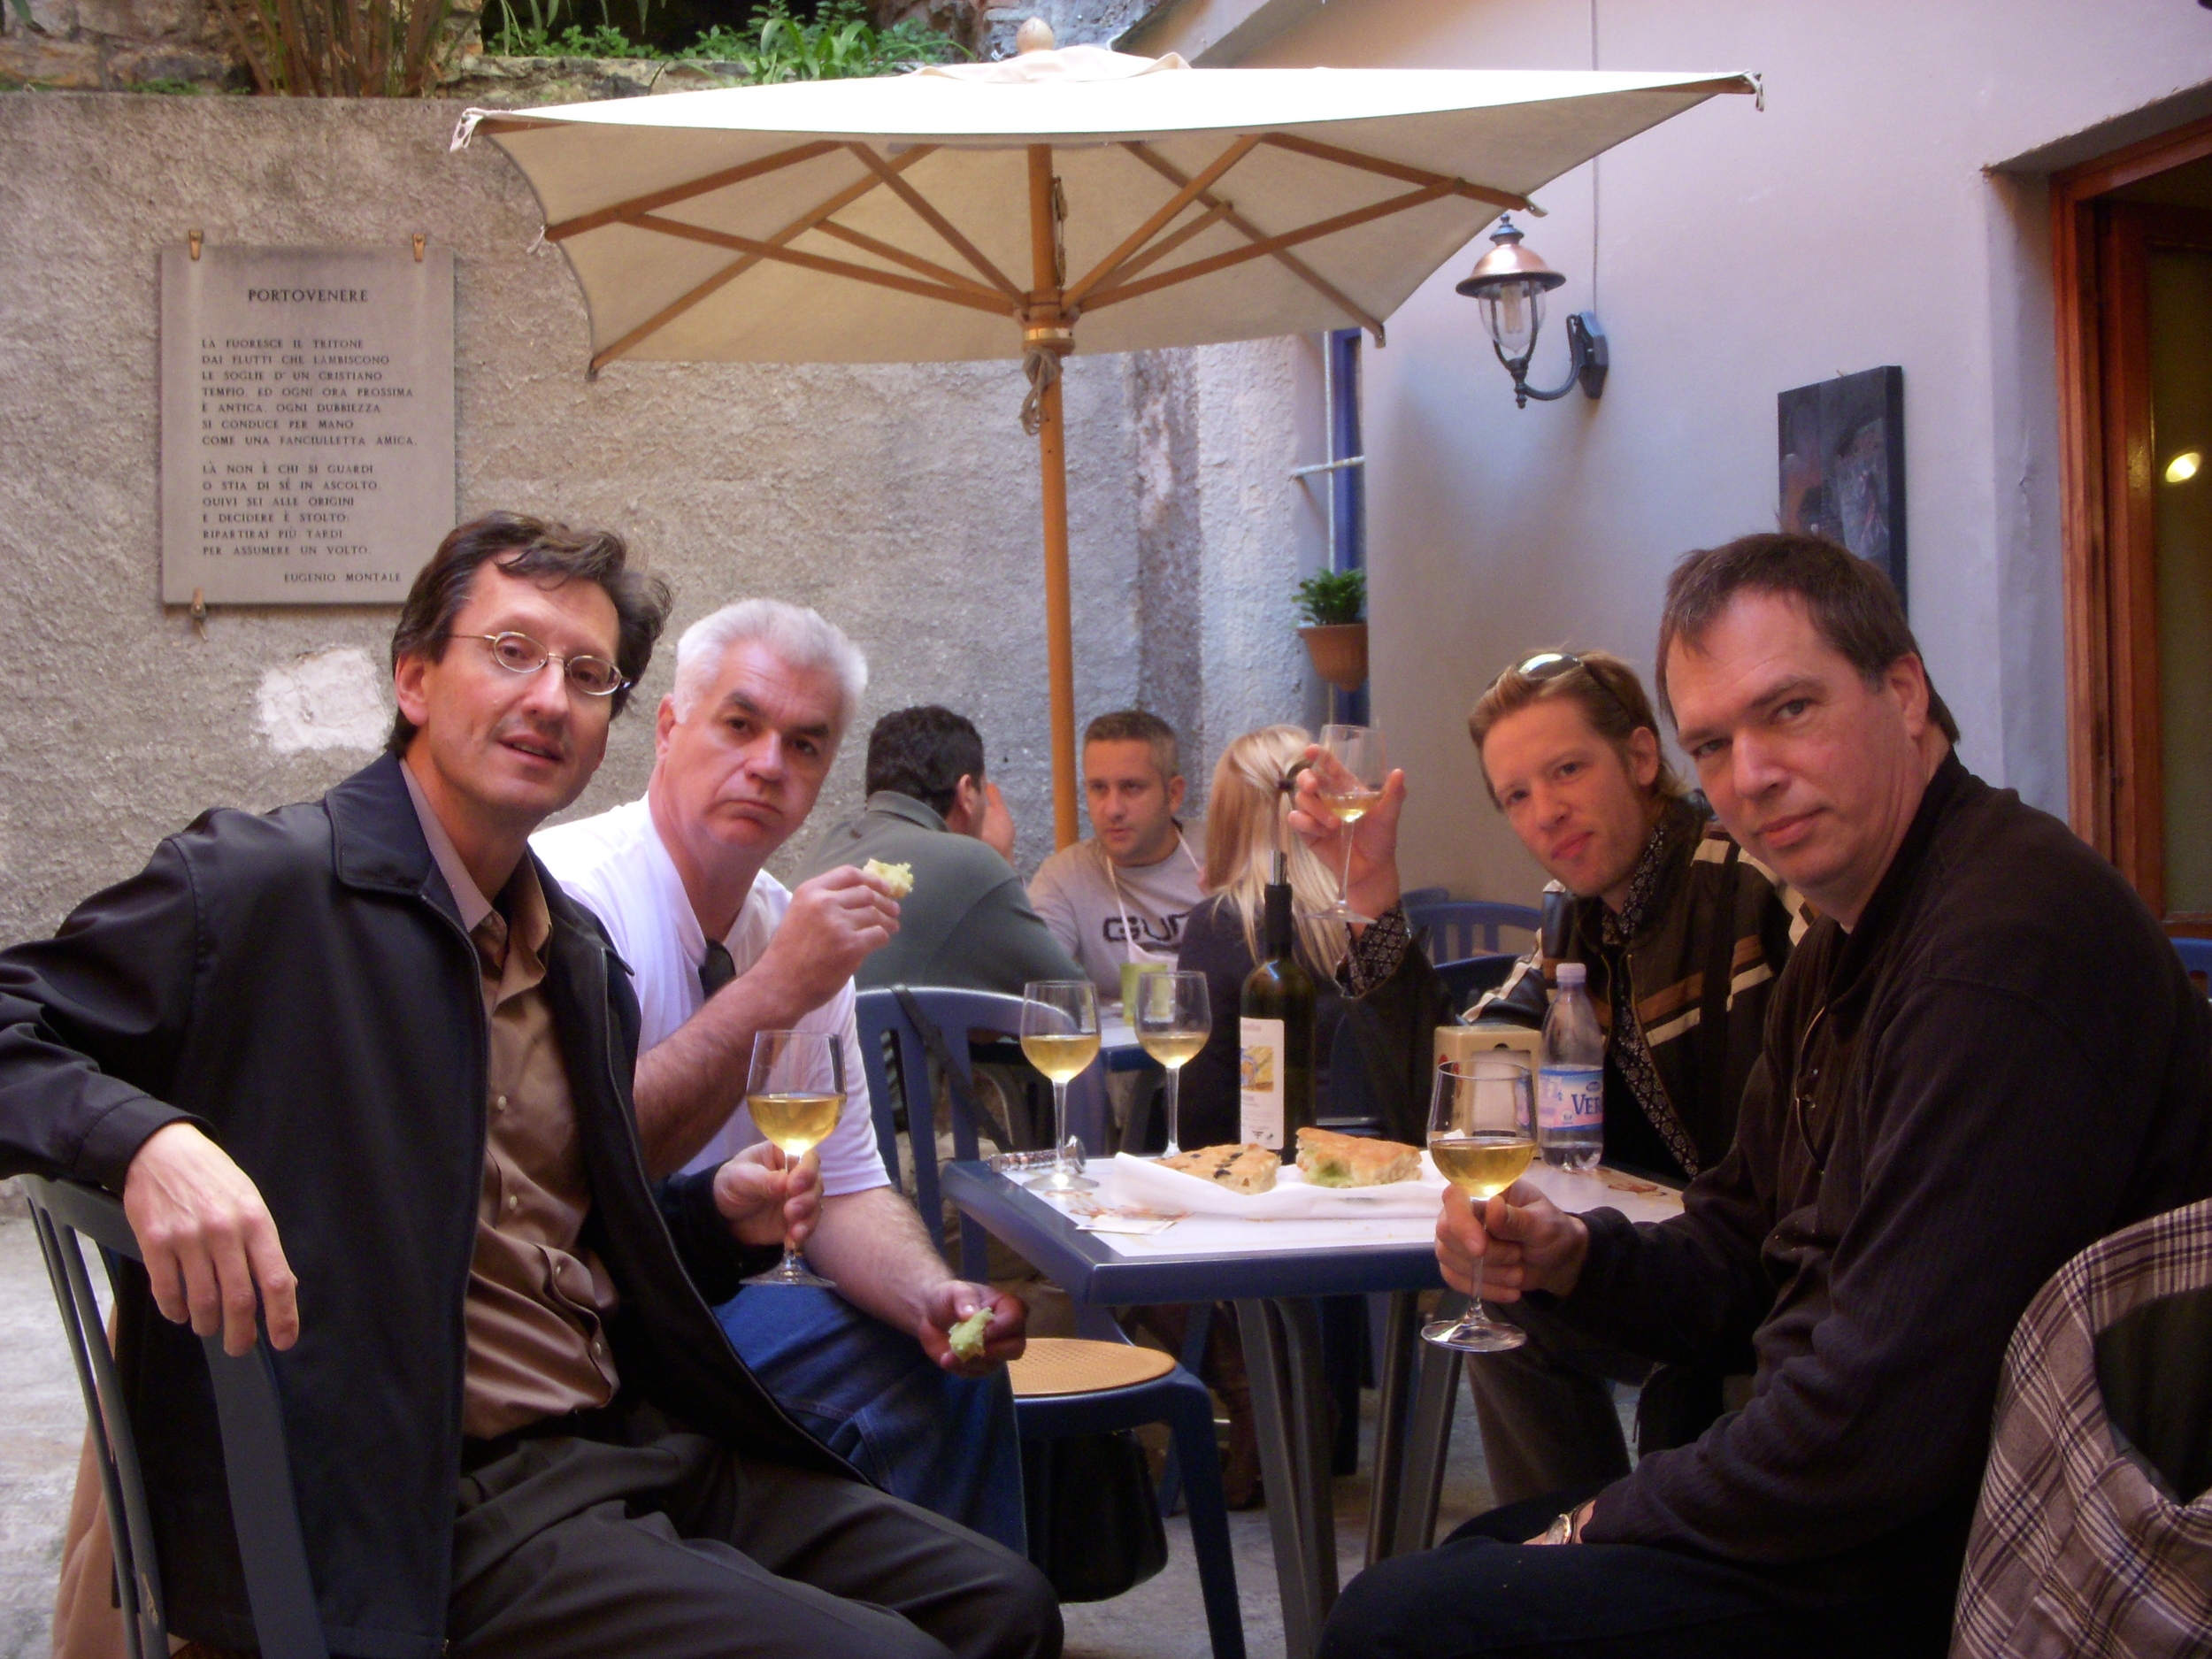 CRO Italy web 2007 - 22.JPG